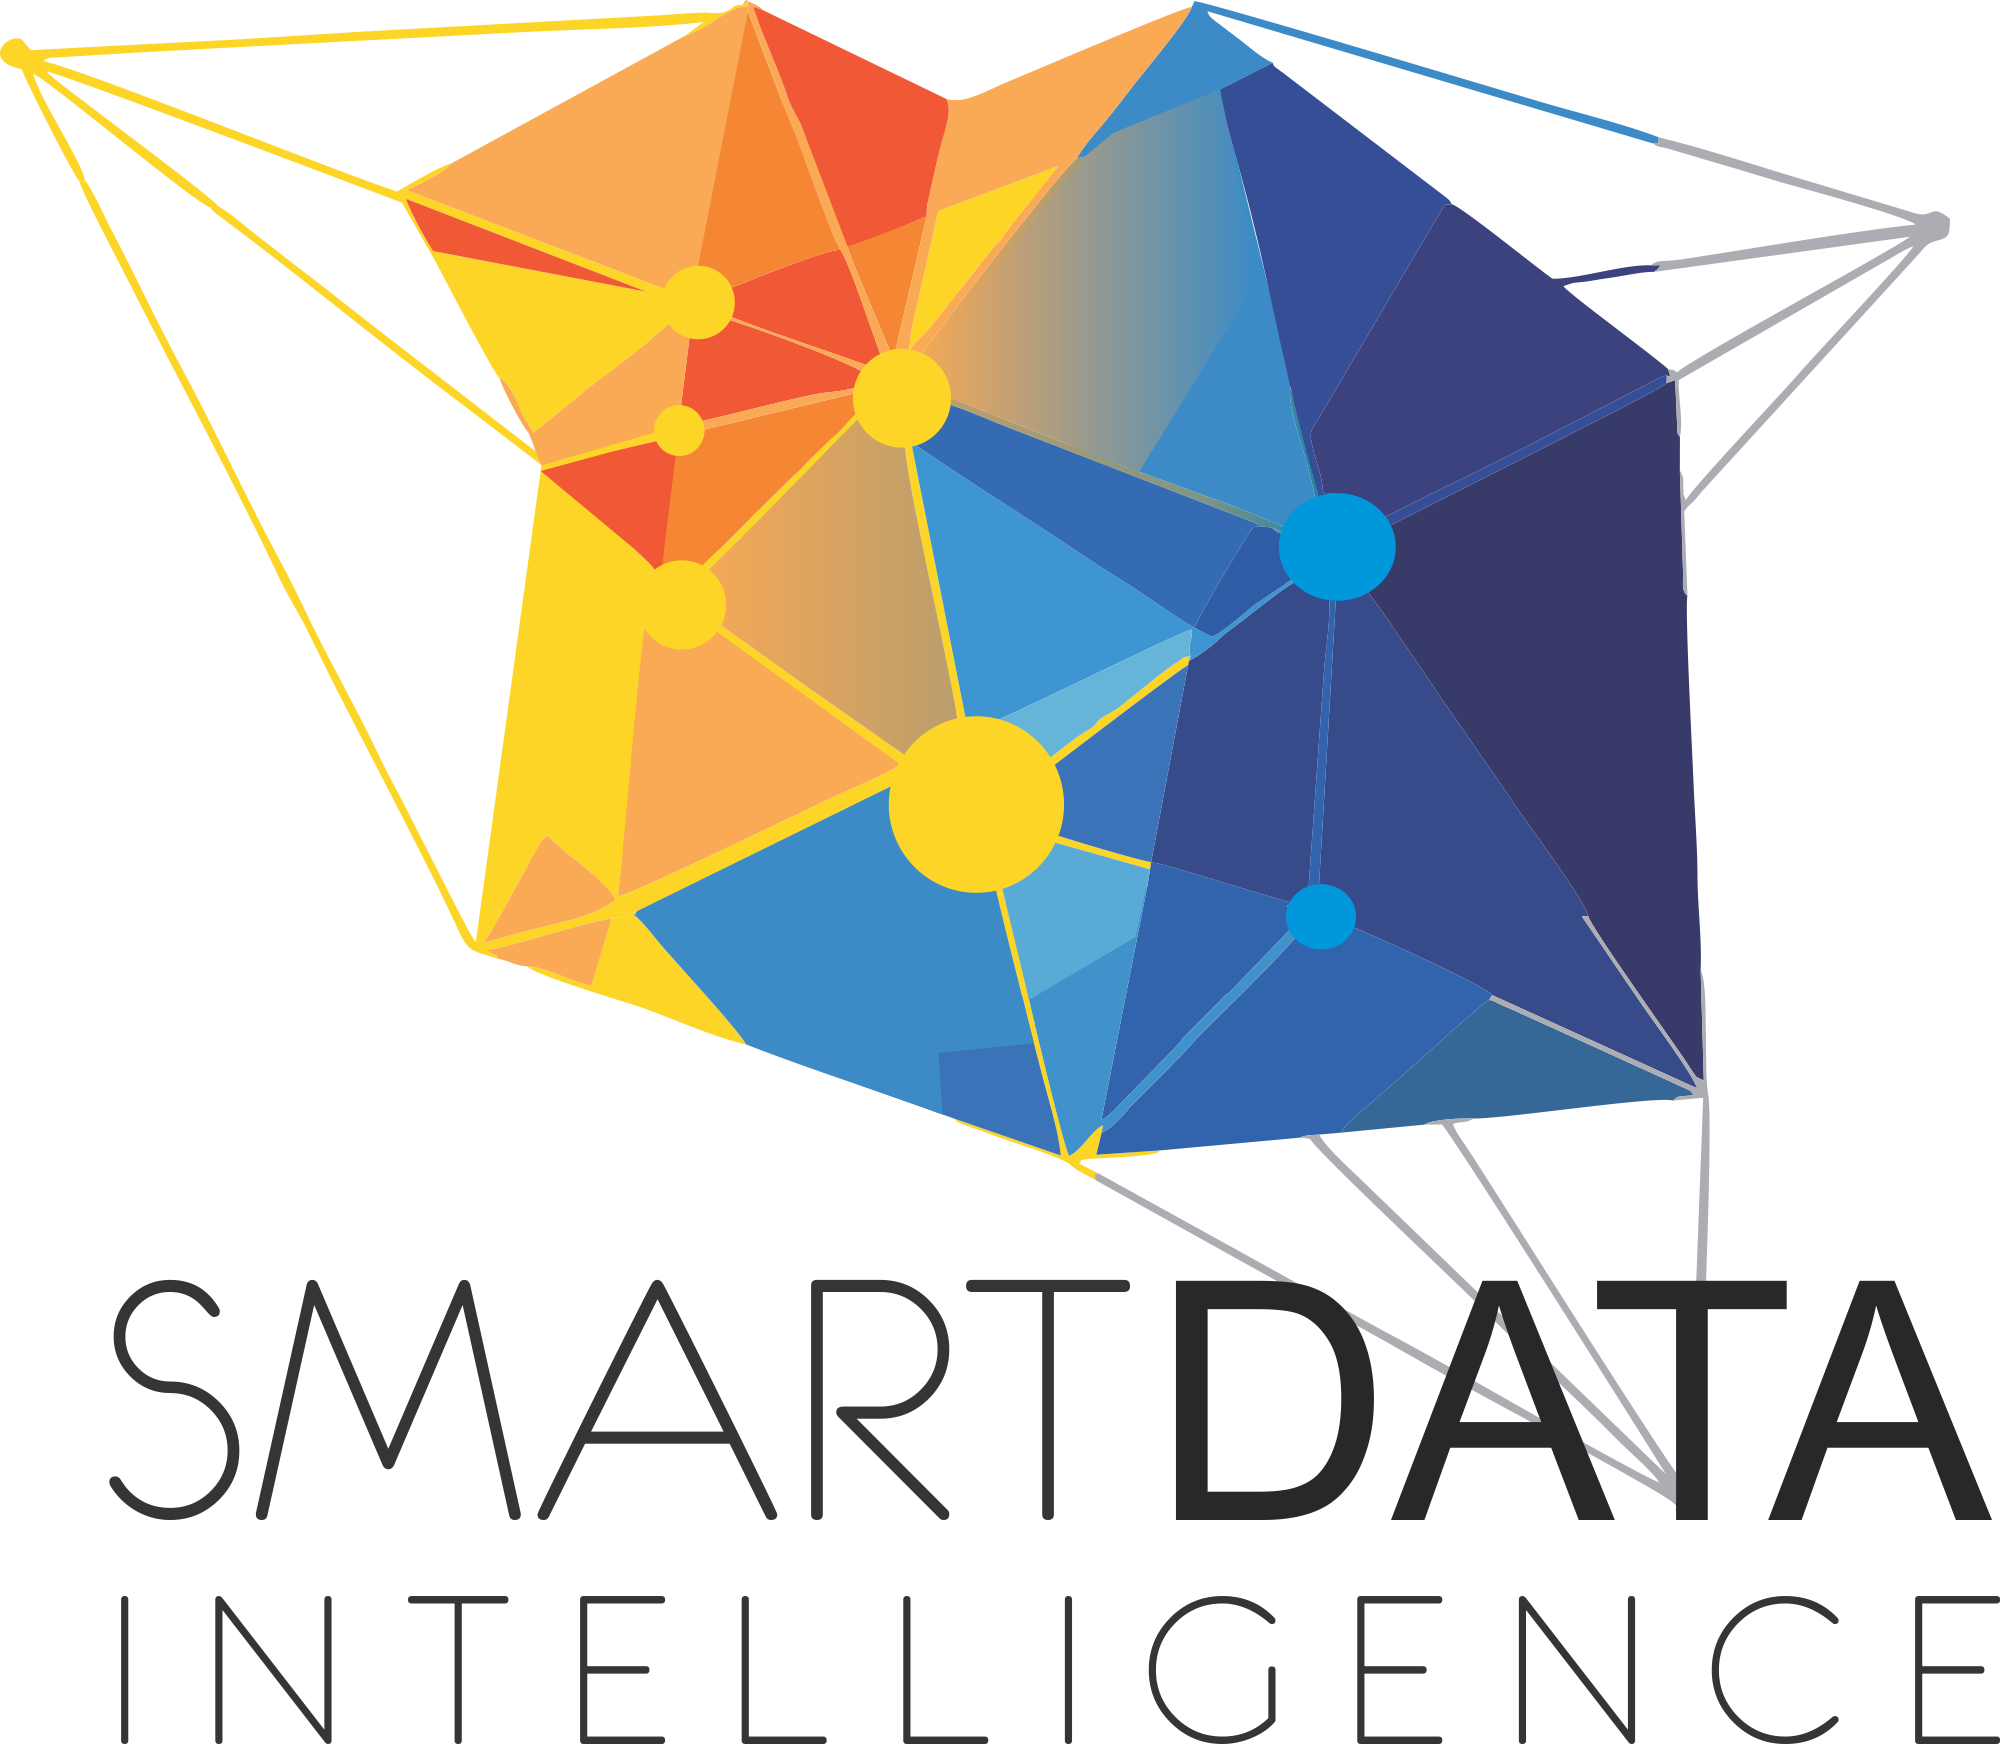 Smart Data Intelligence